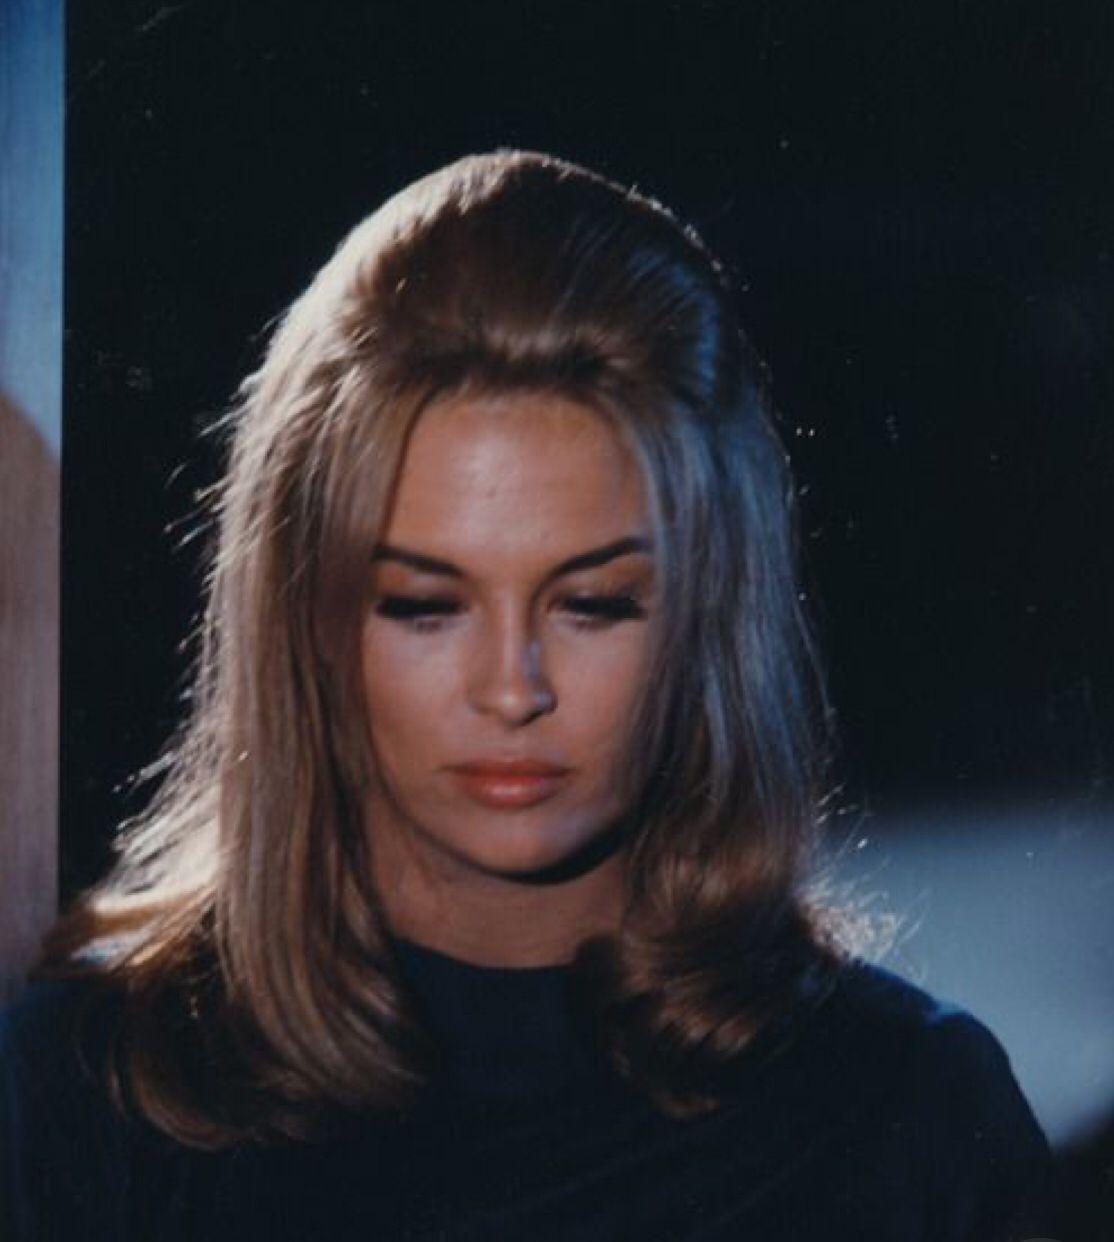 Faye Dunaway In Her 1967 Film The Happening Faye Dunaway